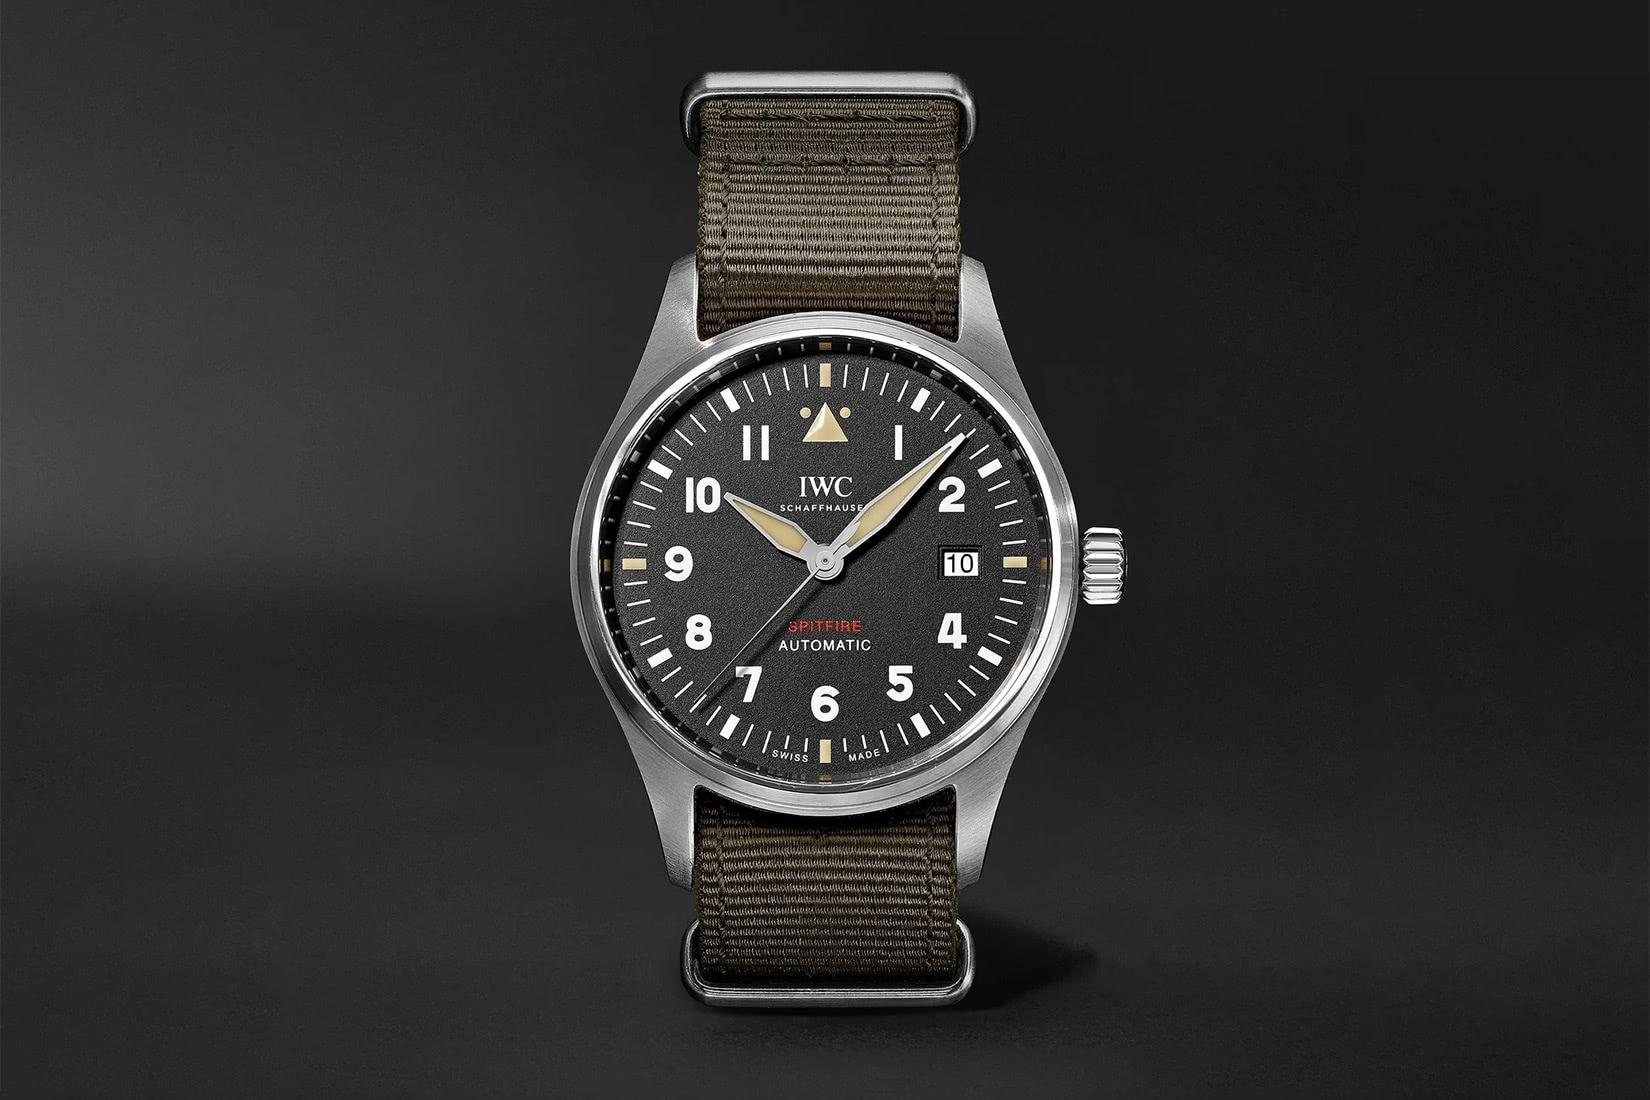 iwc luxury watches pilot's spitfire luxe digital